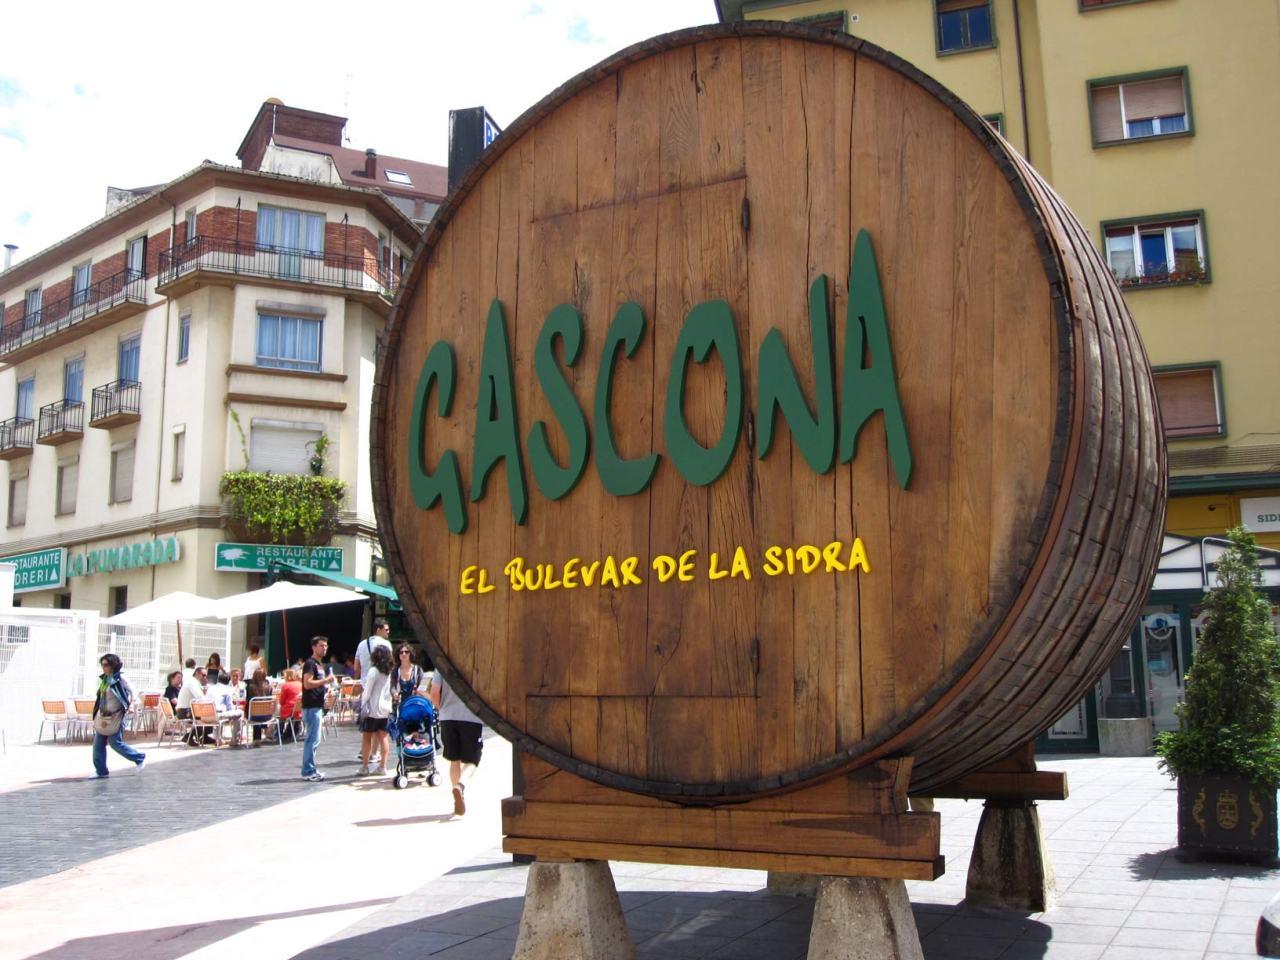 Gascona, El Bulevar de laSidra